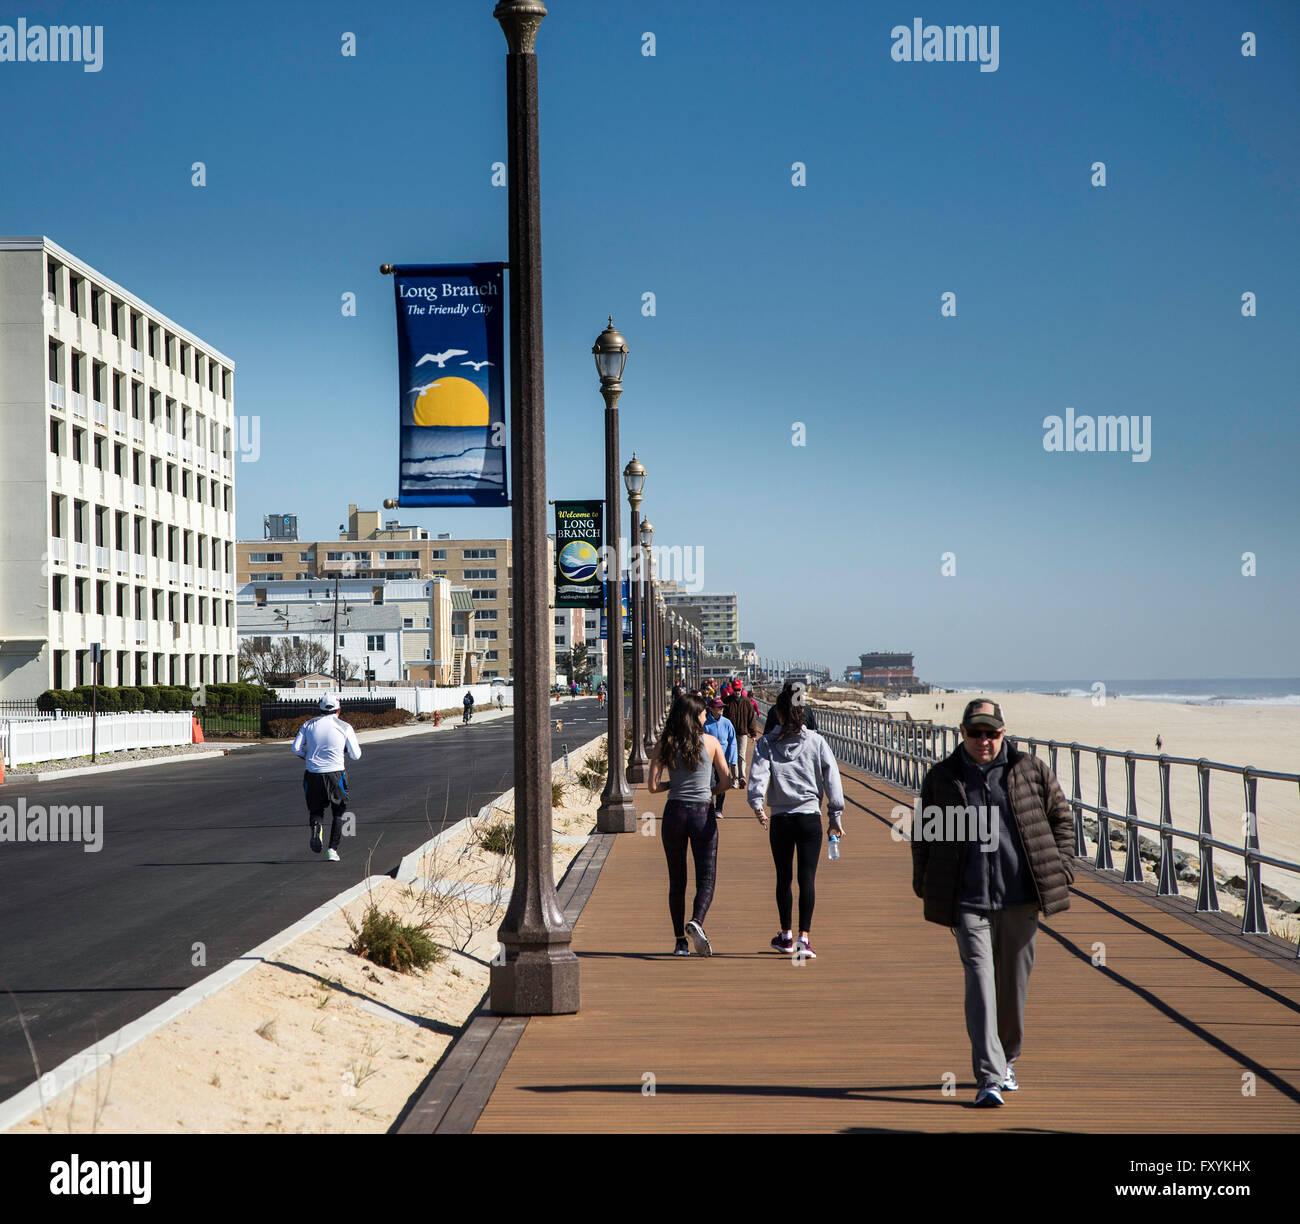 Jersey Shore Boardwalk Stock Photos & Jersey Shore ...